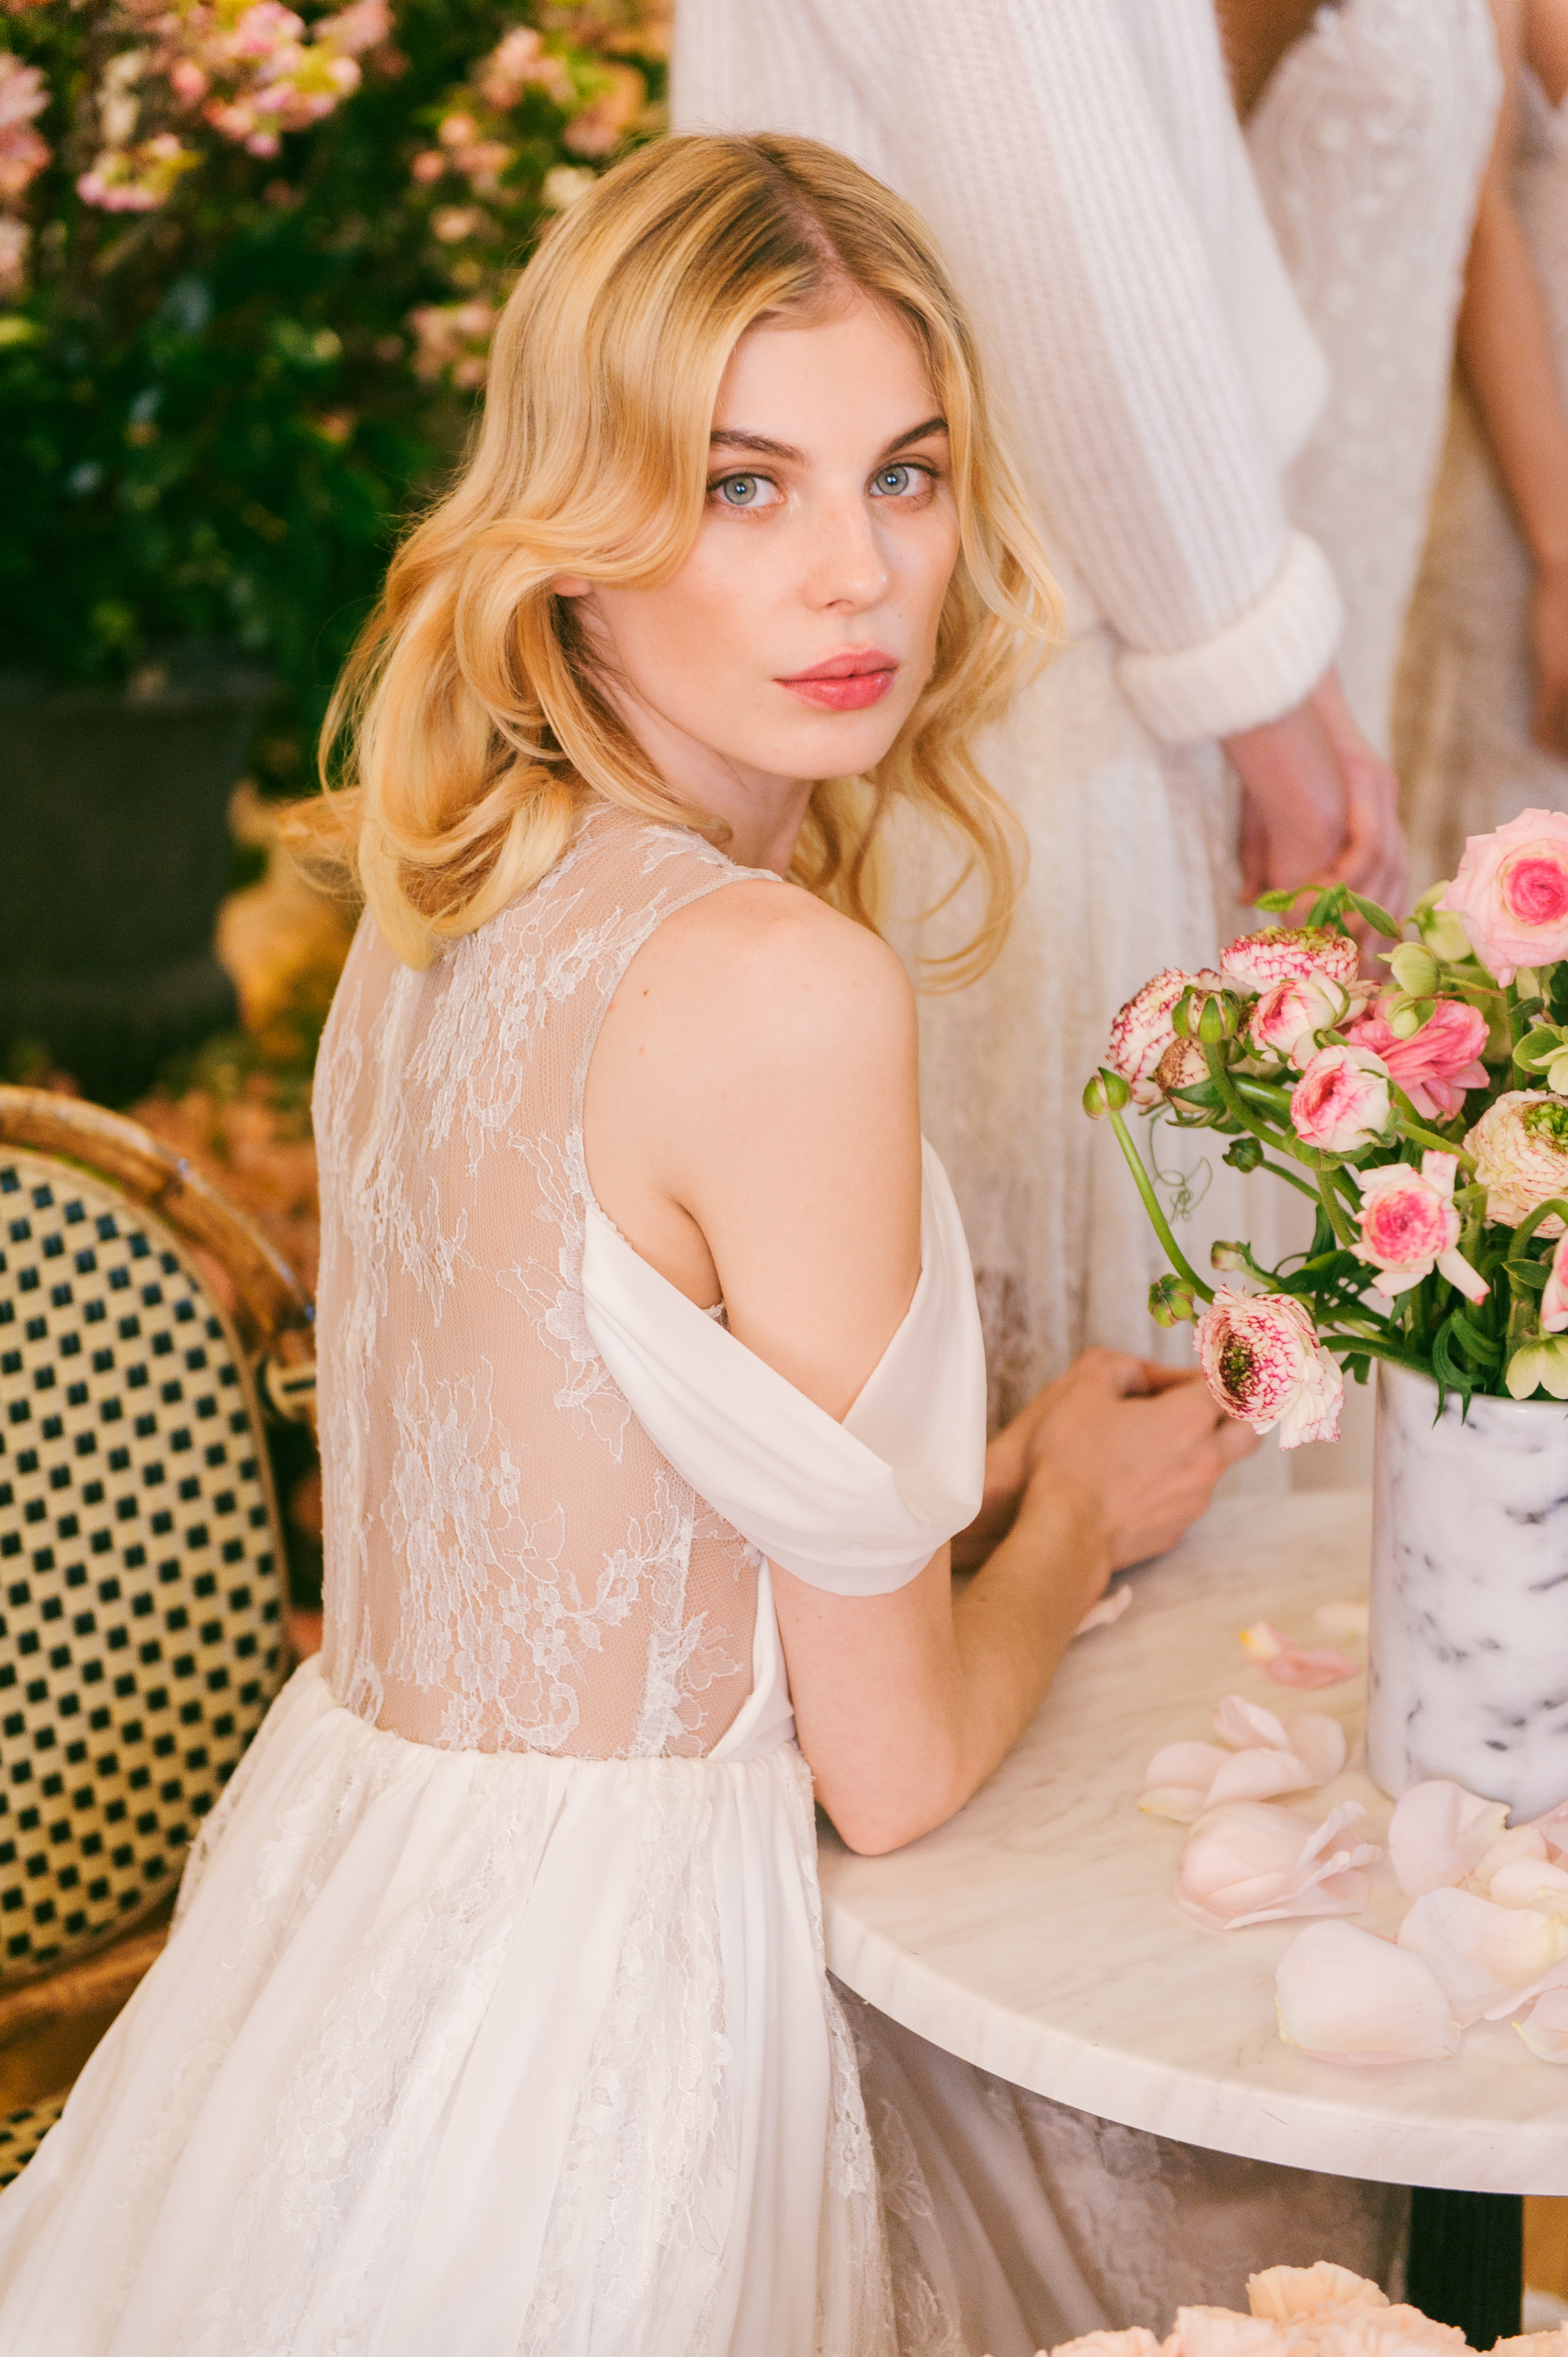 SarahSeven.Romantics.Bridal.163.jpg